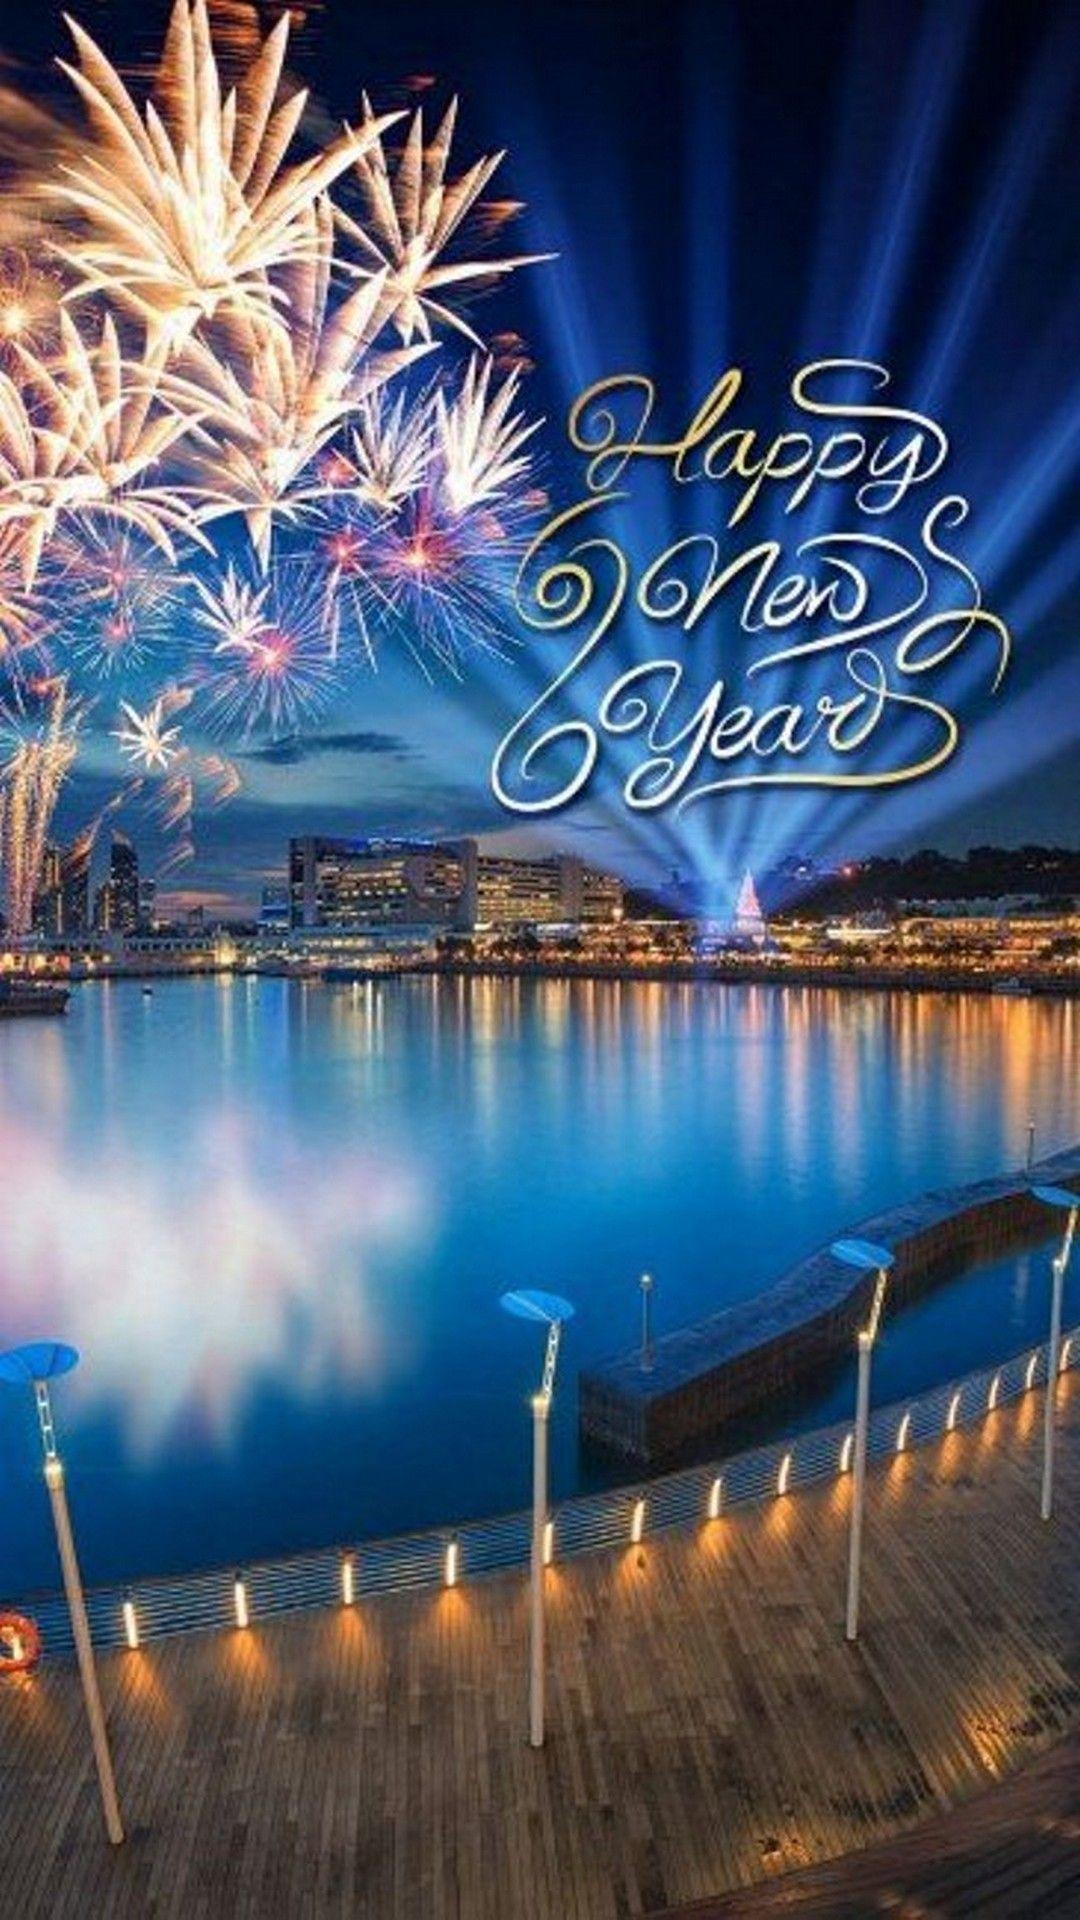 Happy New Year Wallpaper 2019 , HD Wallpaper & Backgrounds